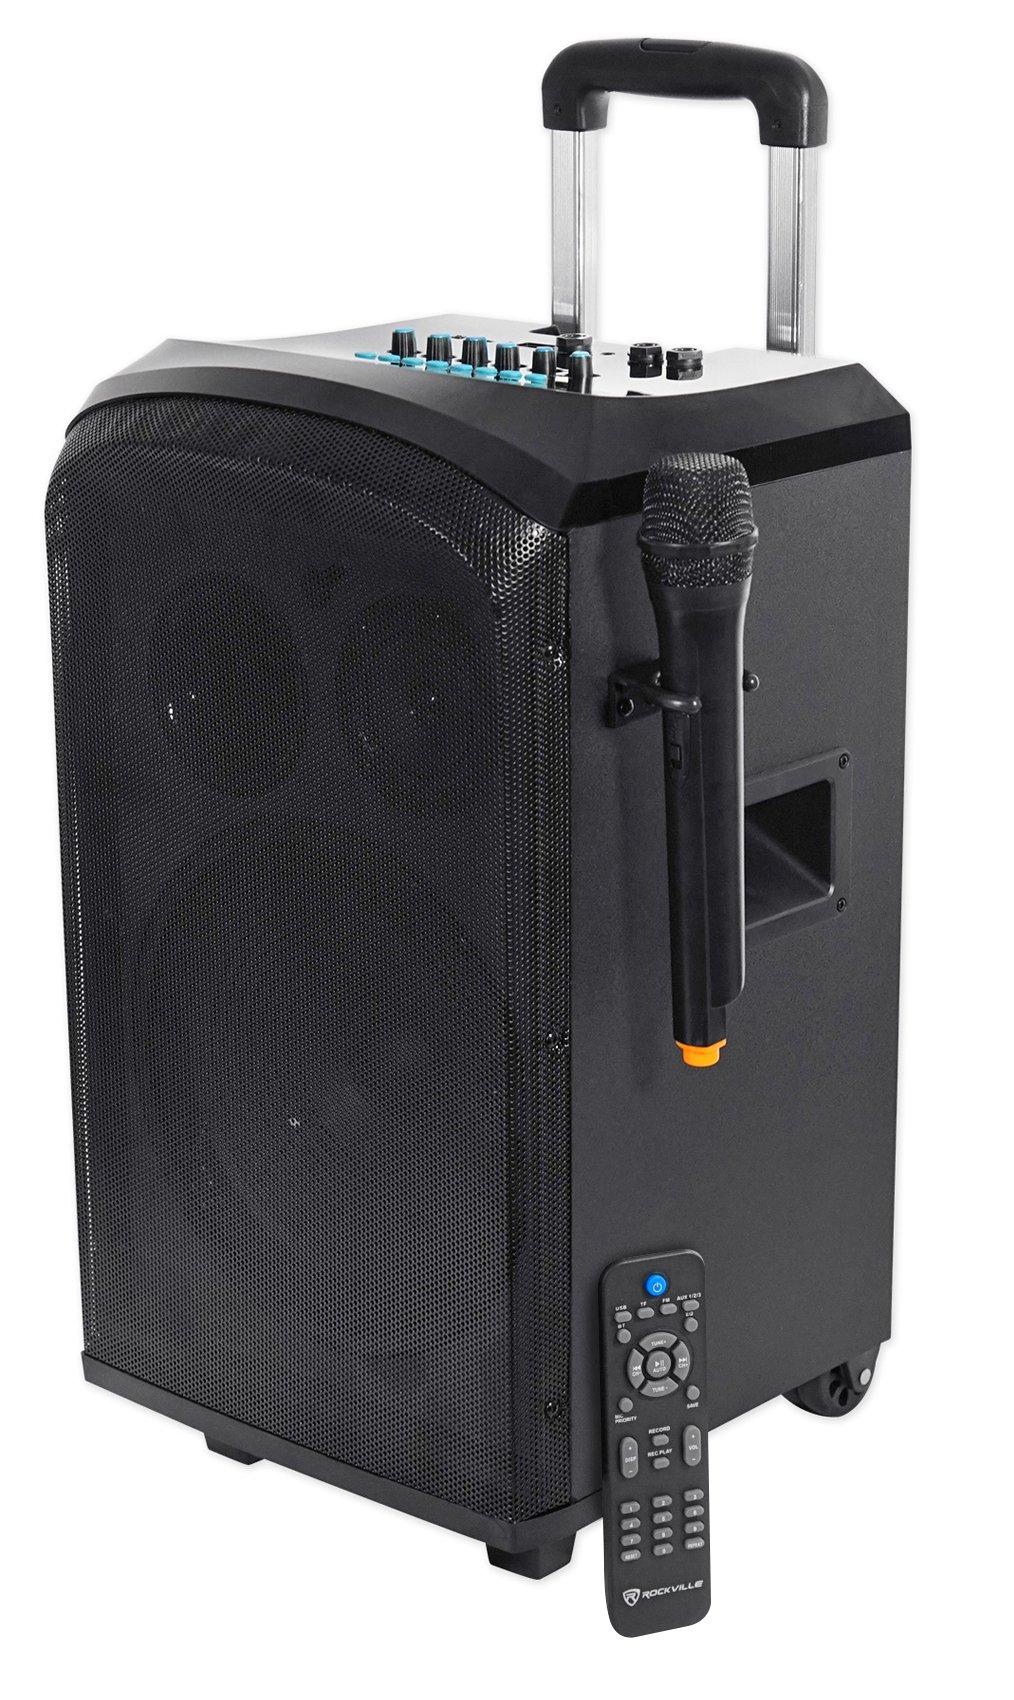 Rockville ROCKnGo 10'' Rechargable Home Theater Bluetooth Speaker+Wireless Mic